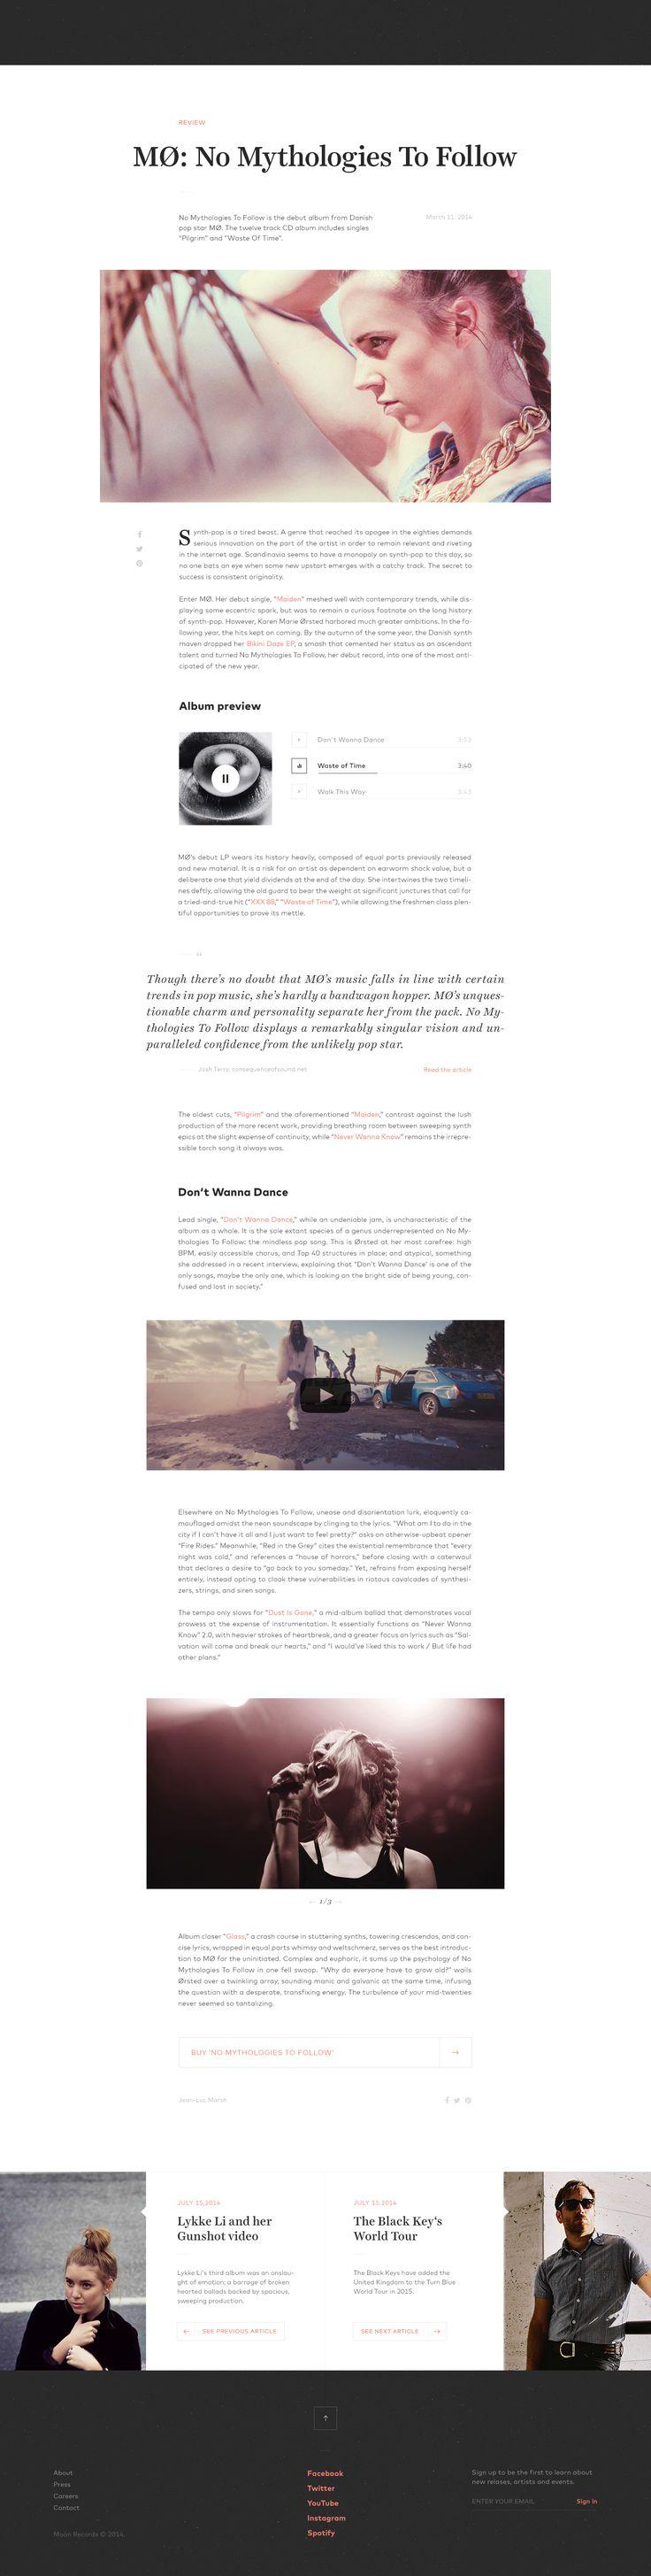 17 Best images about WEB design: article layout on Pinterest   Ui ...